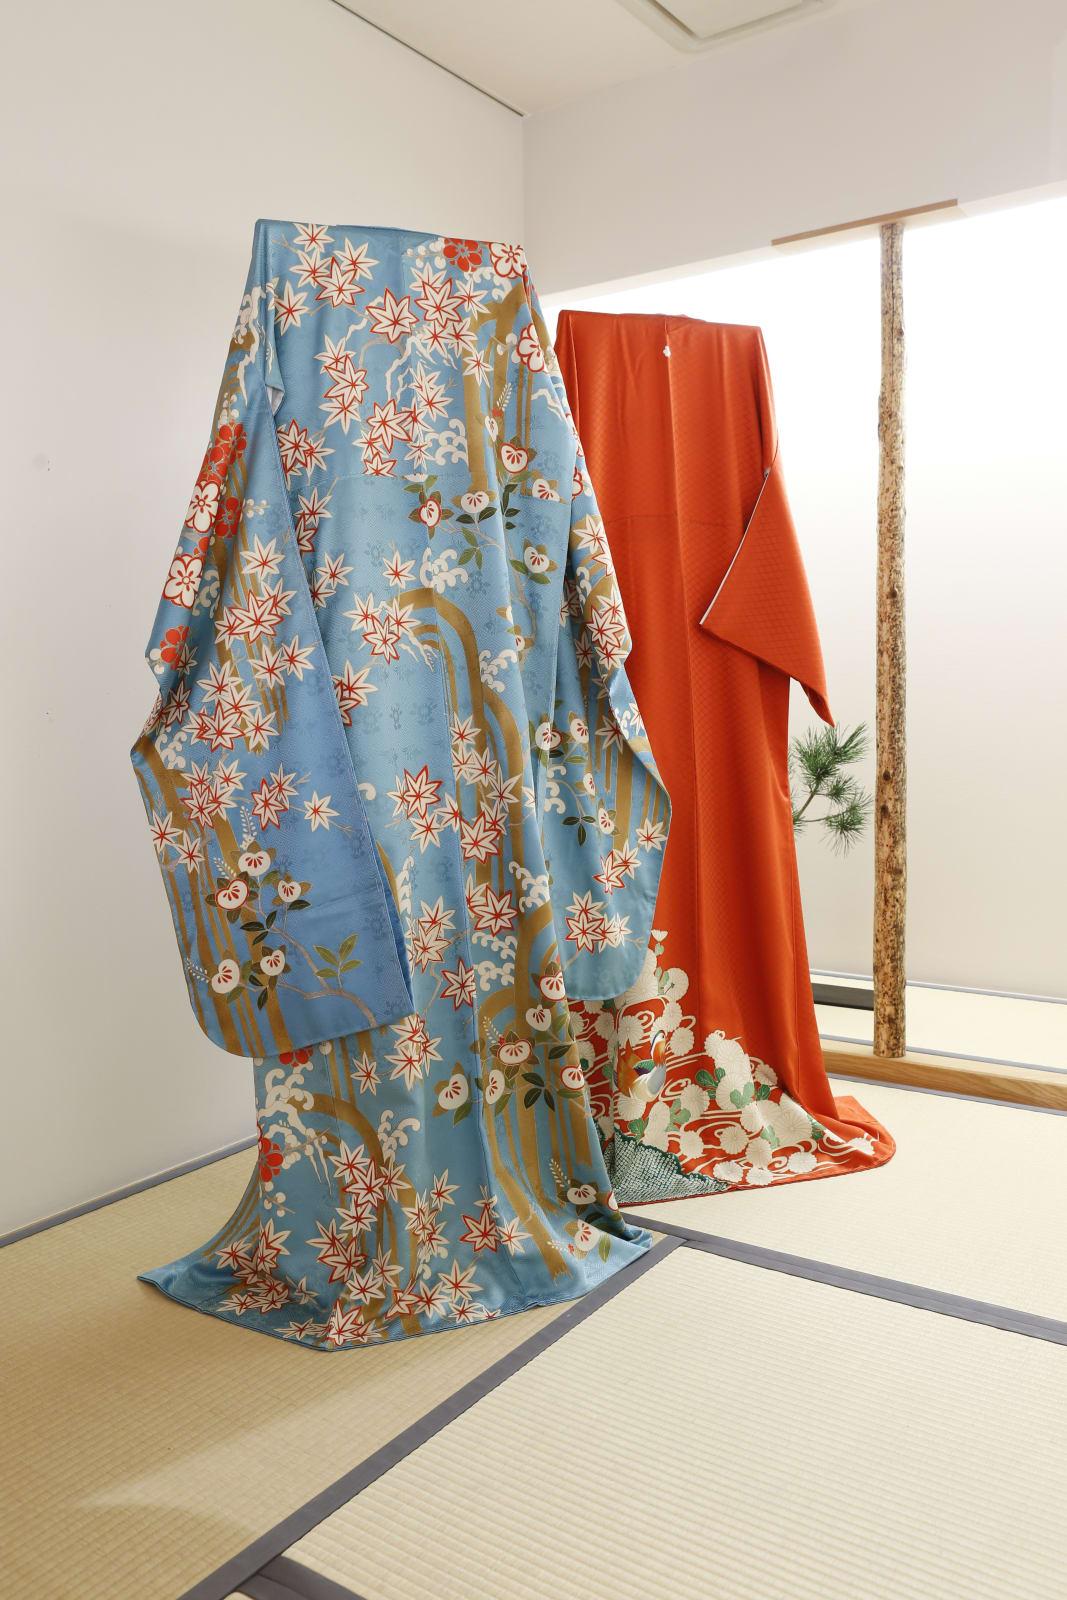 Hime | The Princess of Japan